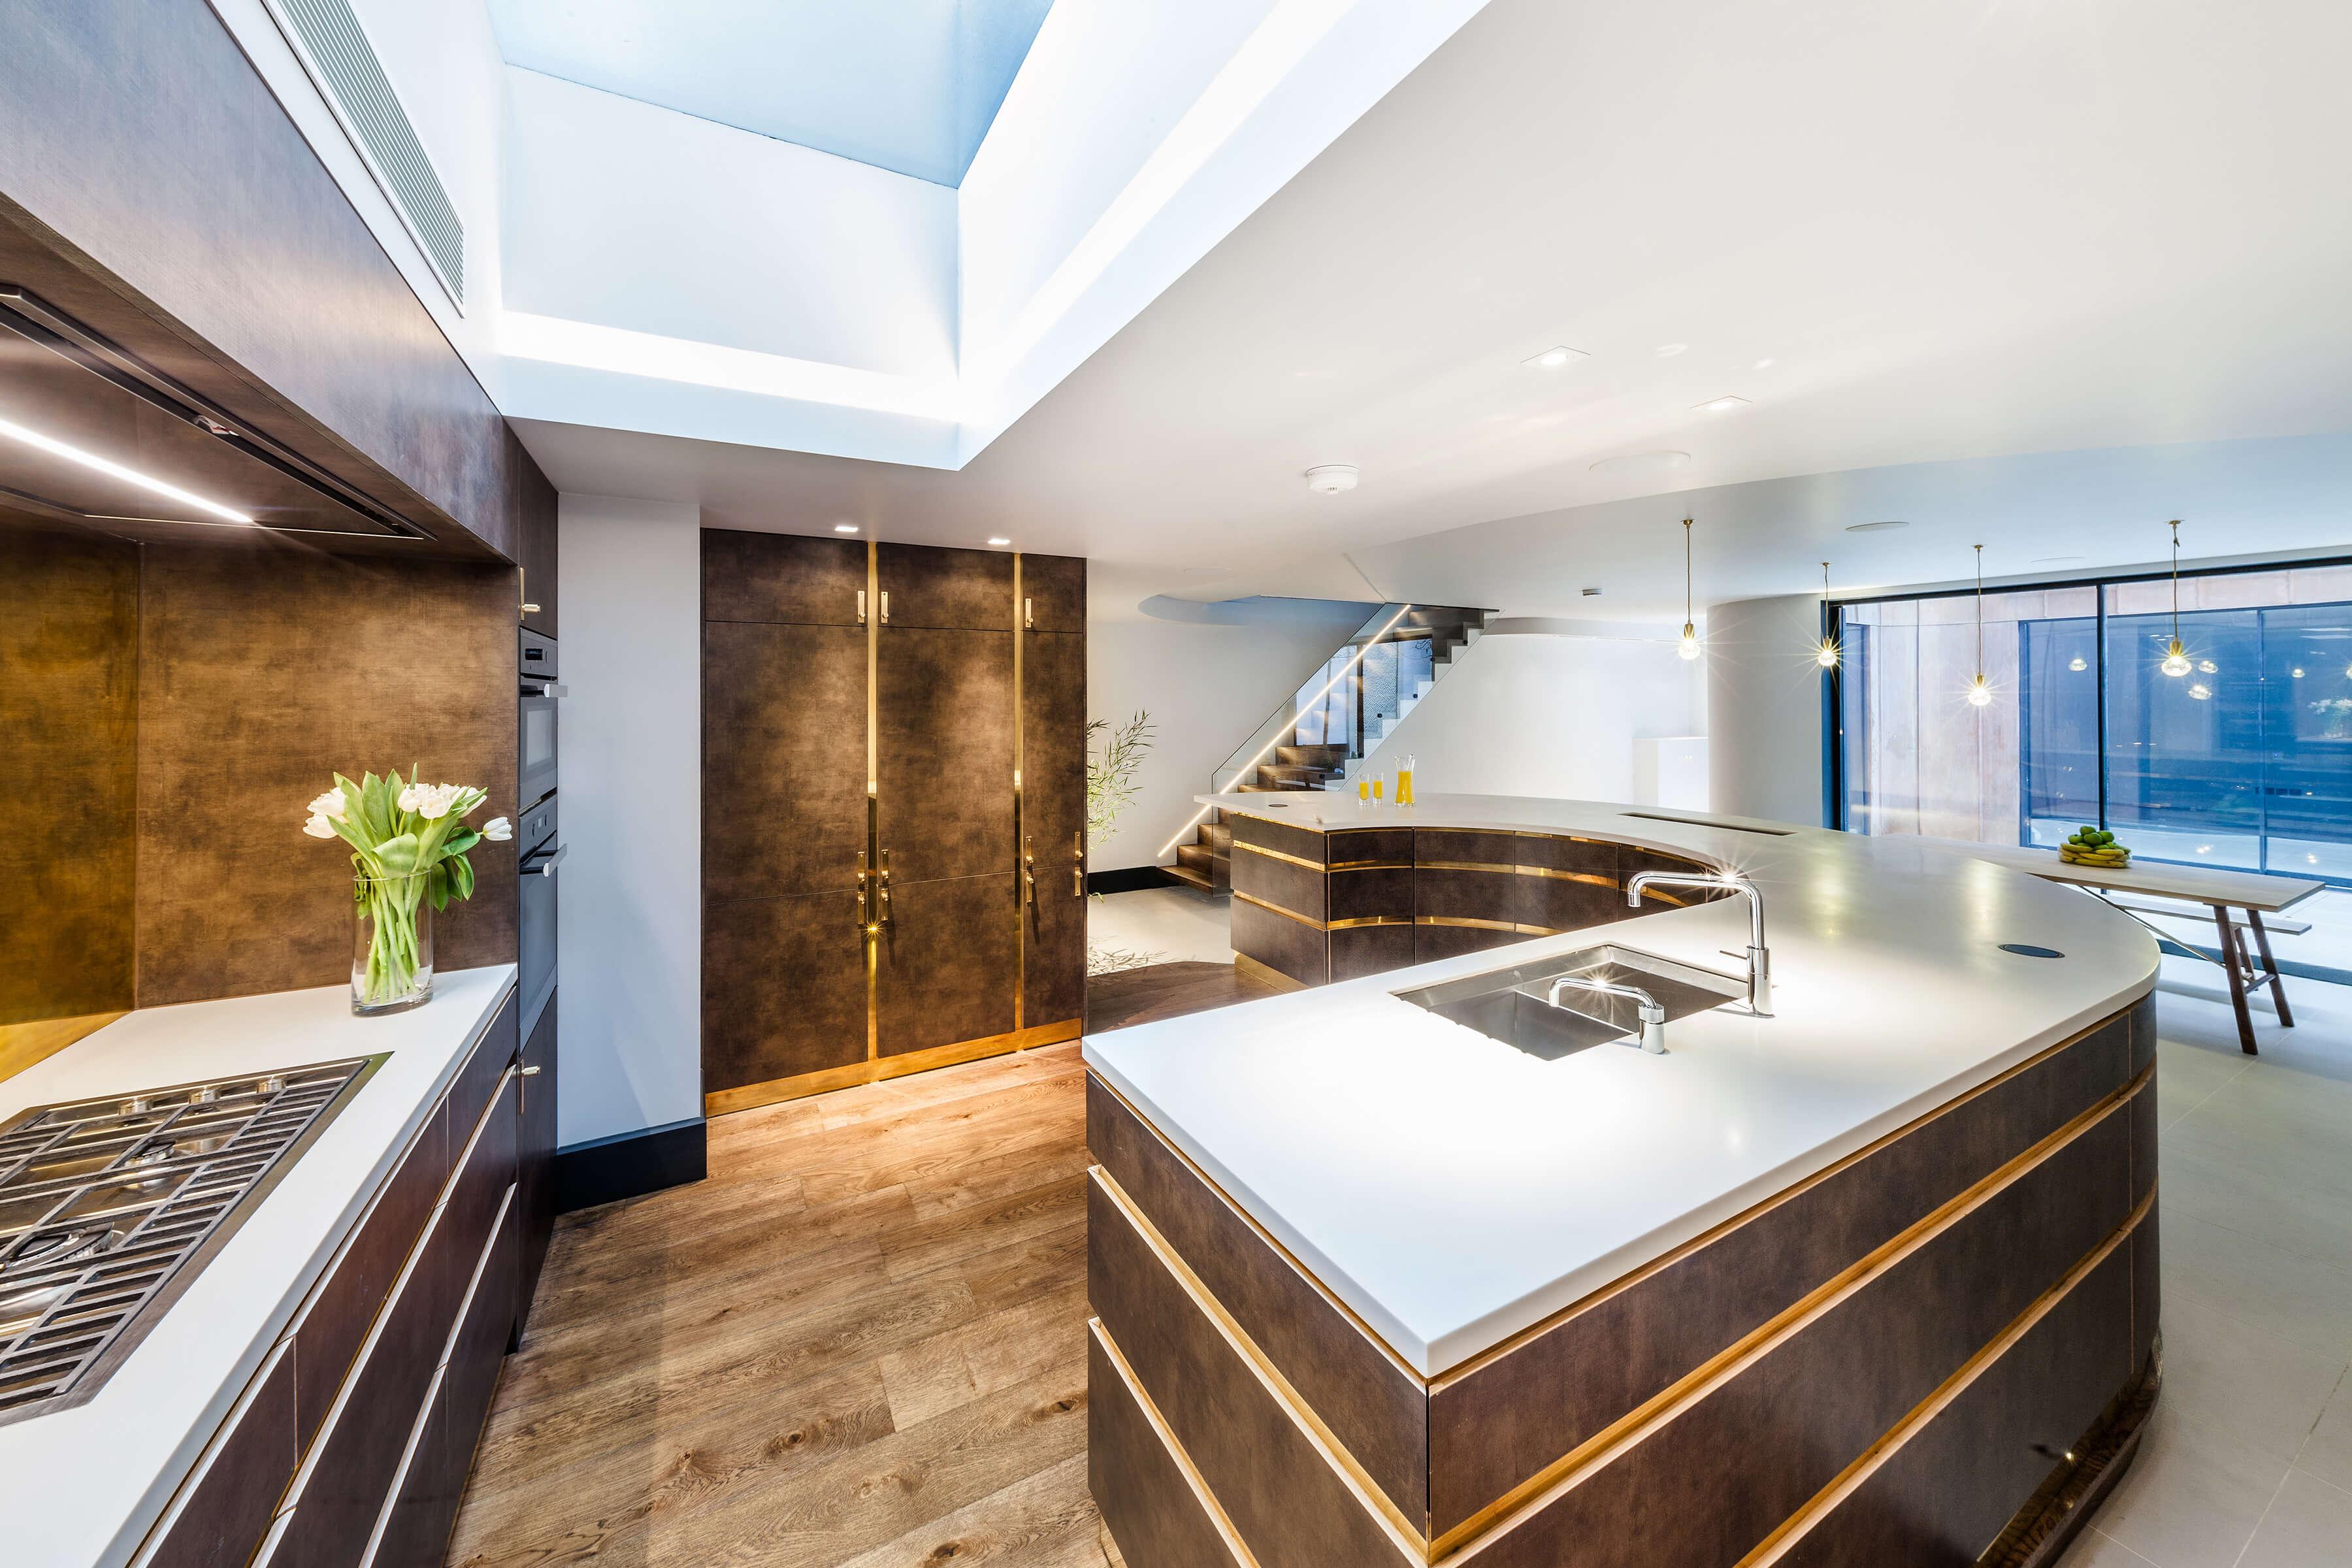 Custom kitchen by Splinterworks for luxurious entertaining